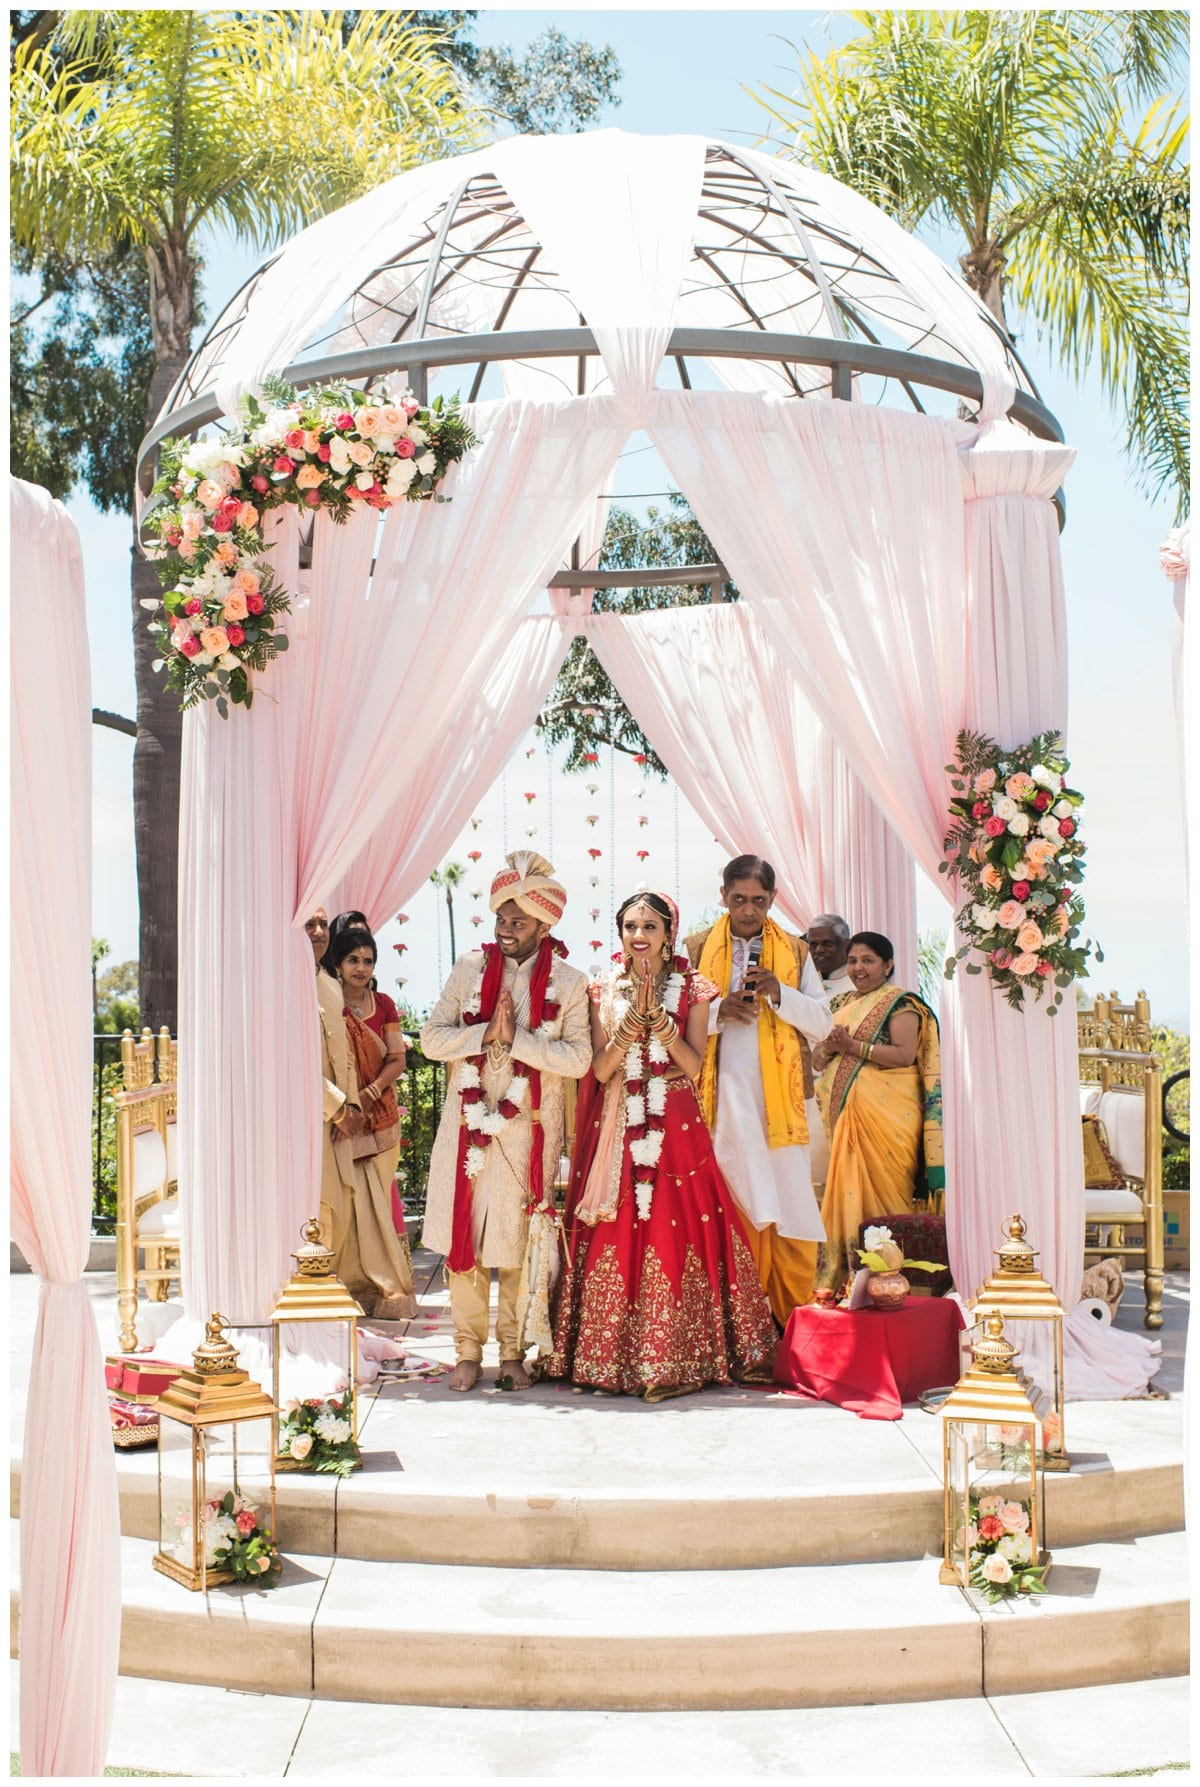 Hotel-Irvine-Indian-Wedding-Carissa-Woo-Photography_0069.jpg